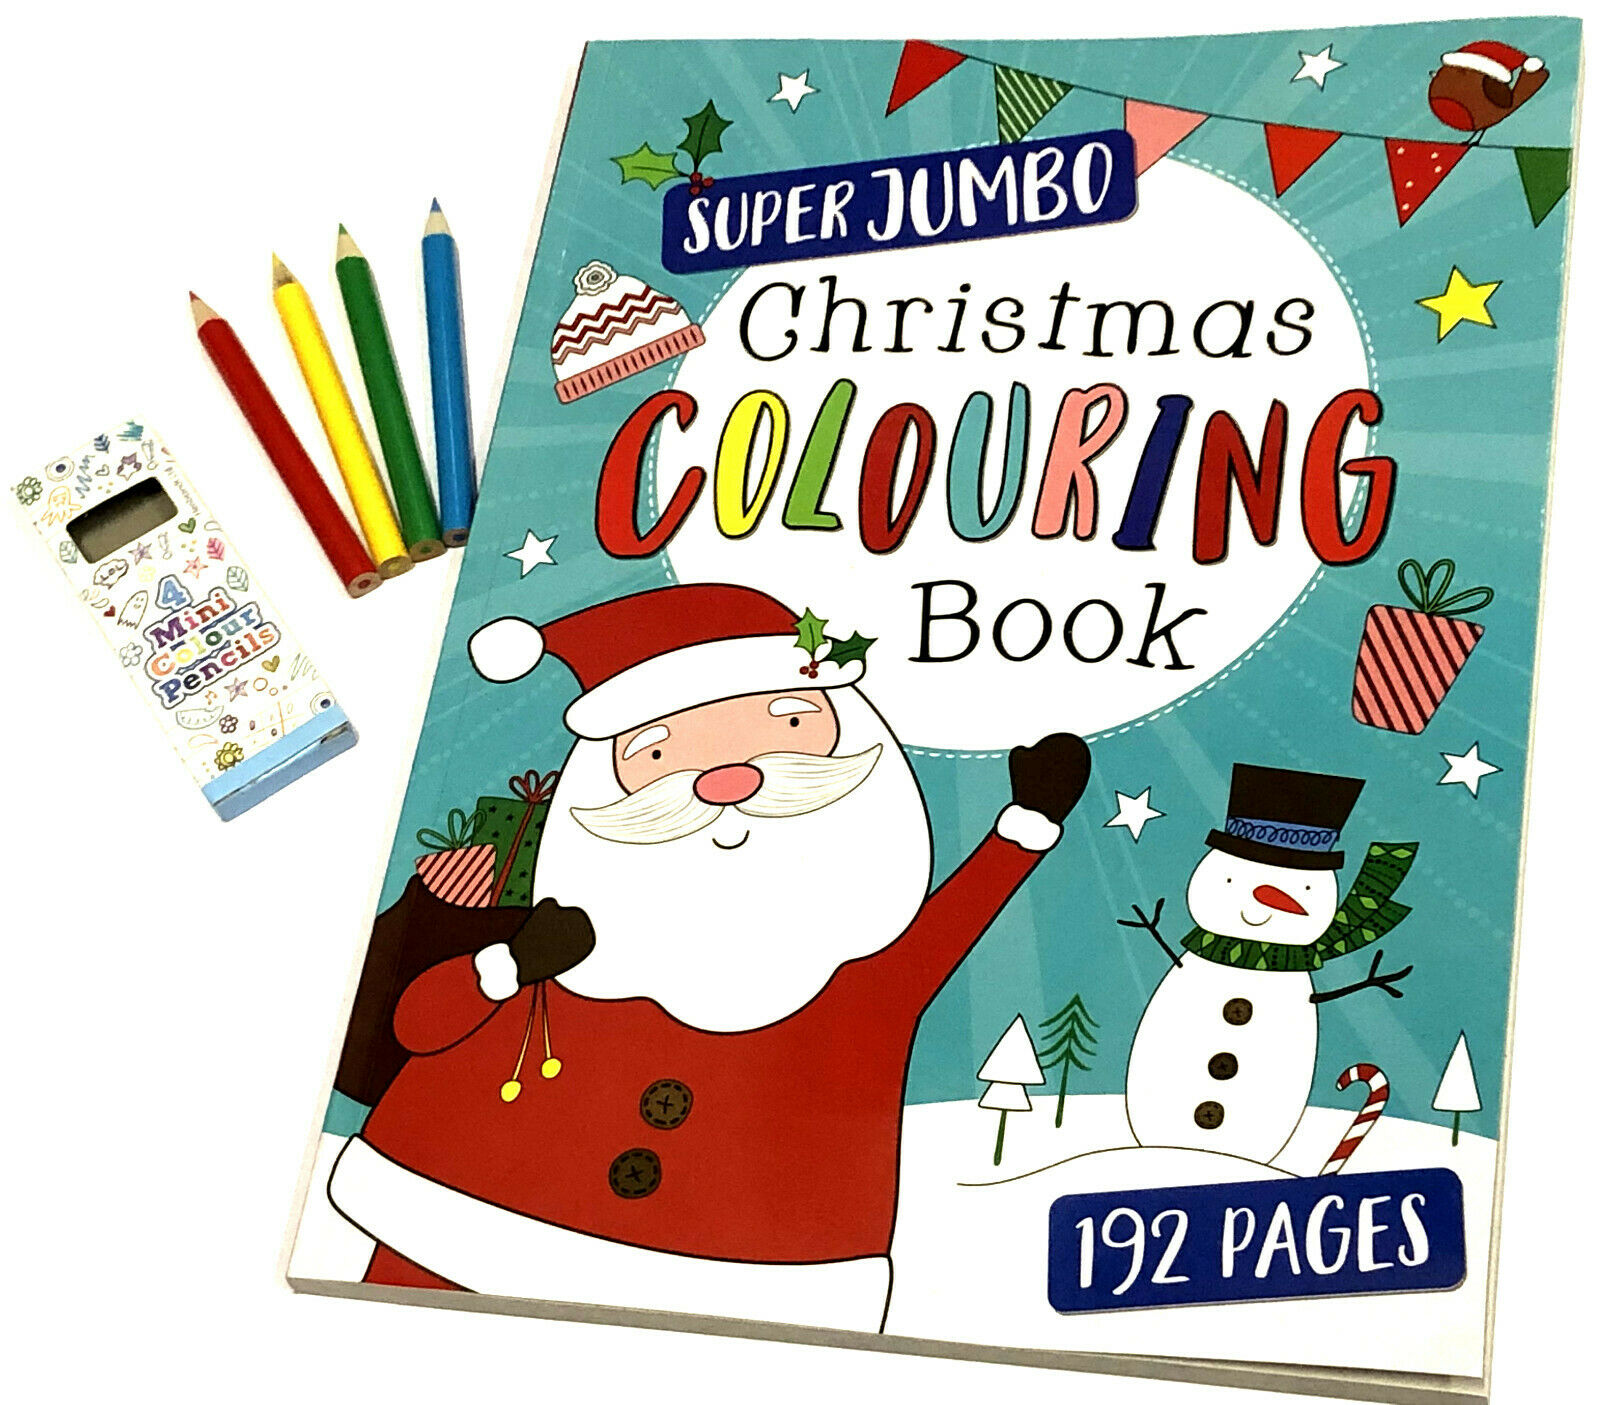 JUMBO CHRISTMAS COLOURING BOOK & PENCIL XMAS EVE BOX STOCKING FILLER A4 192 PAGE | eBay